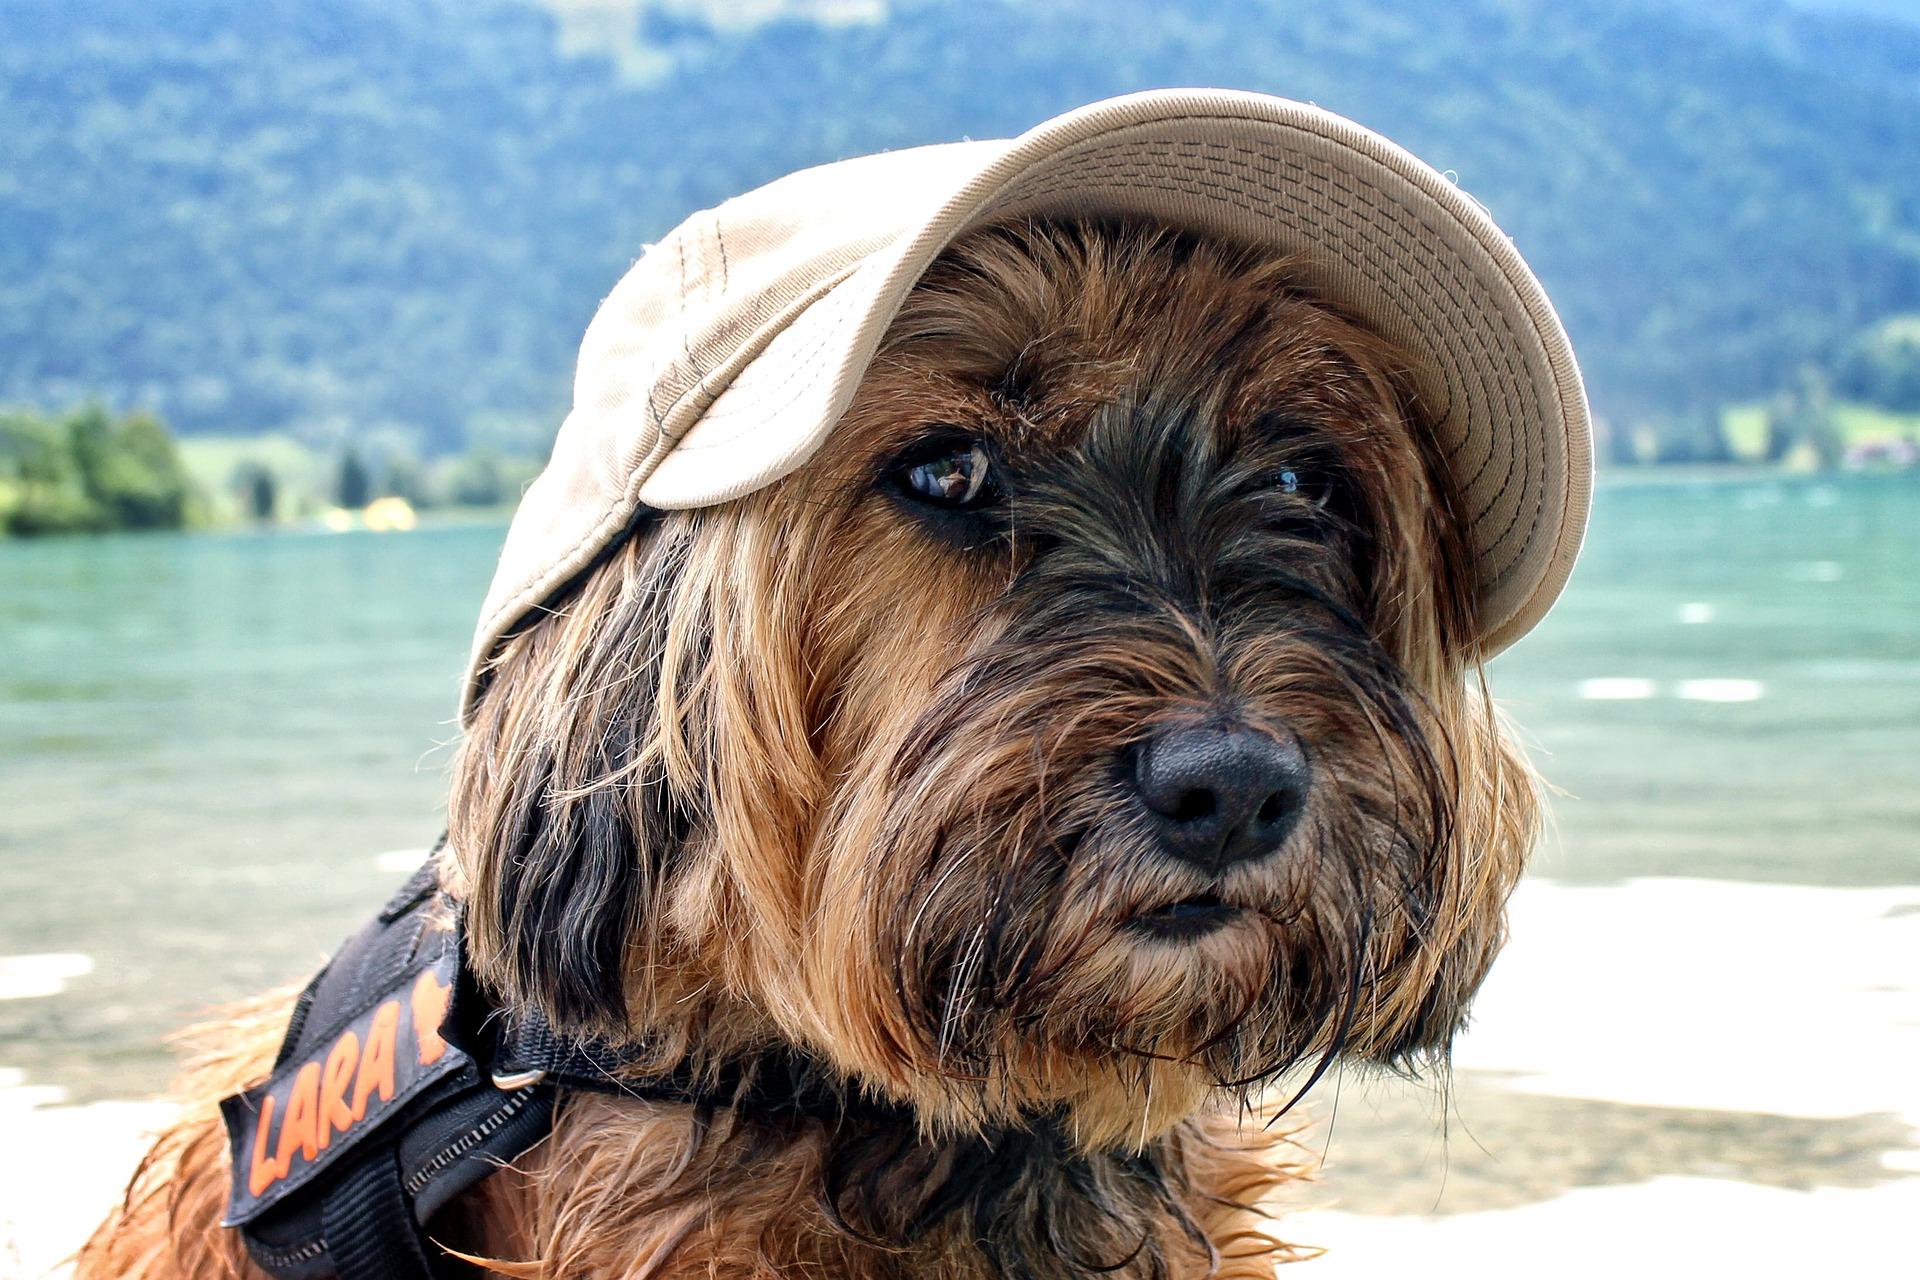 dog-858646_1920_Meldung_Urlaub